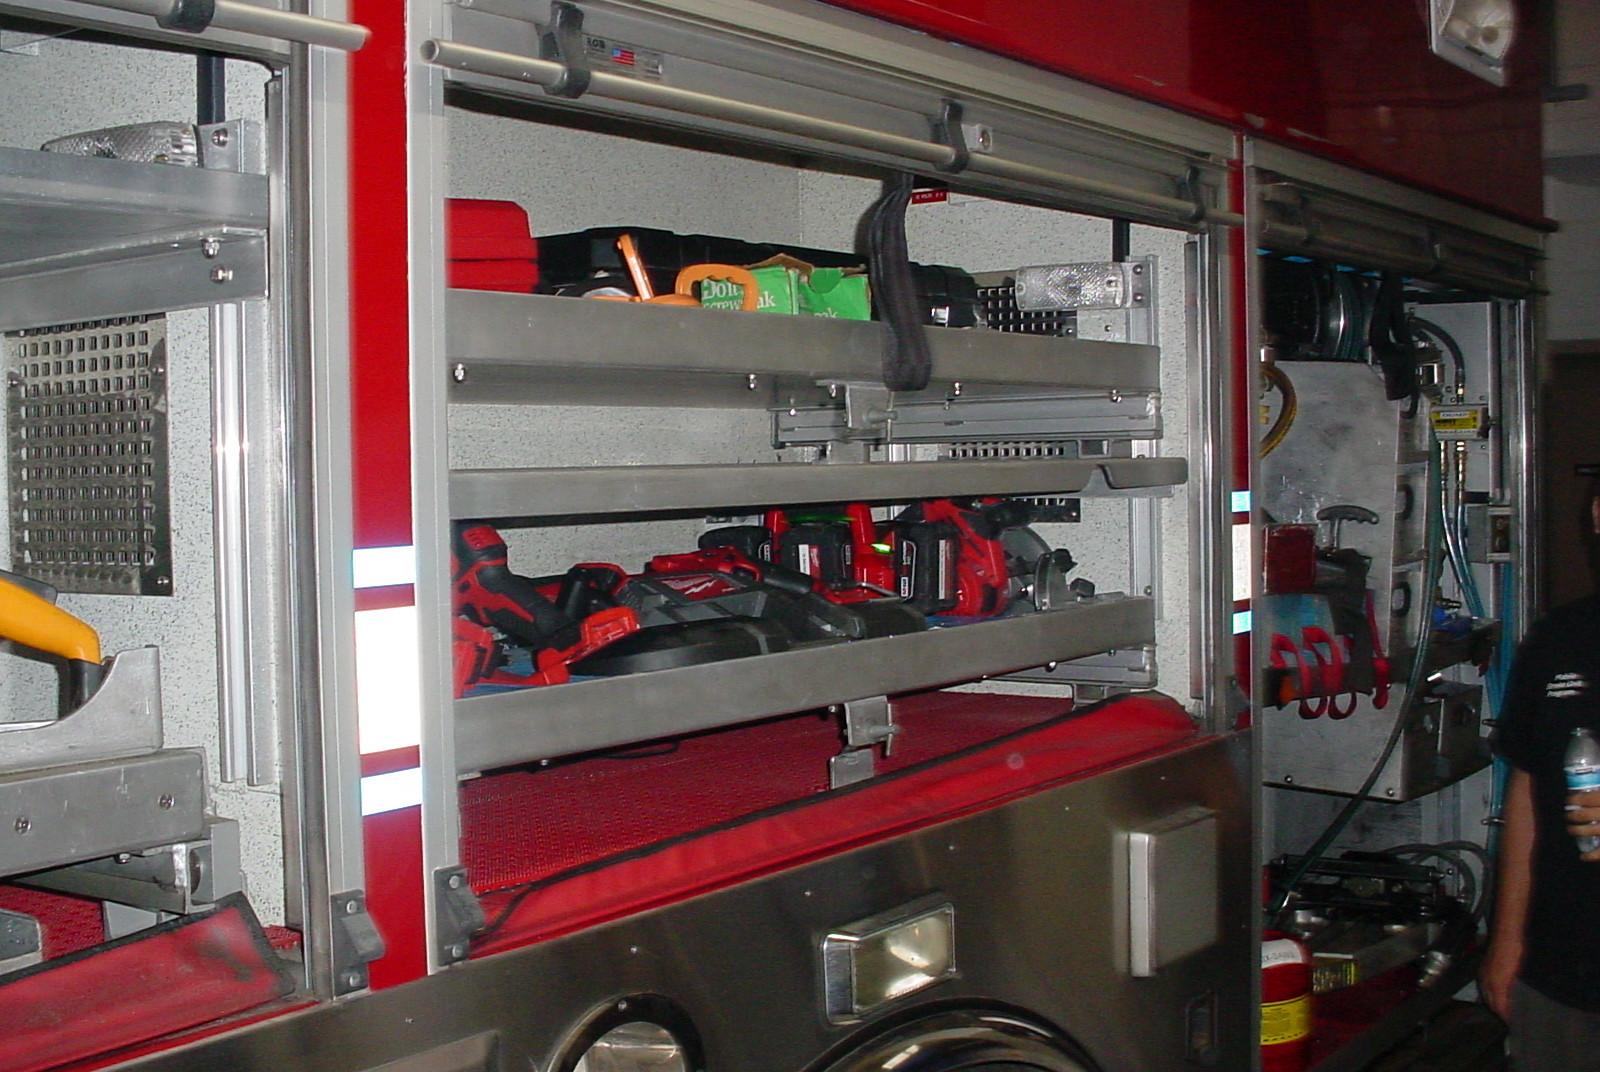 Equipment on Smithtown F.D. Engine